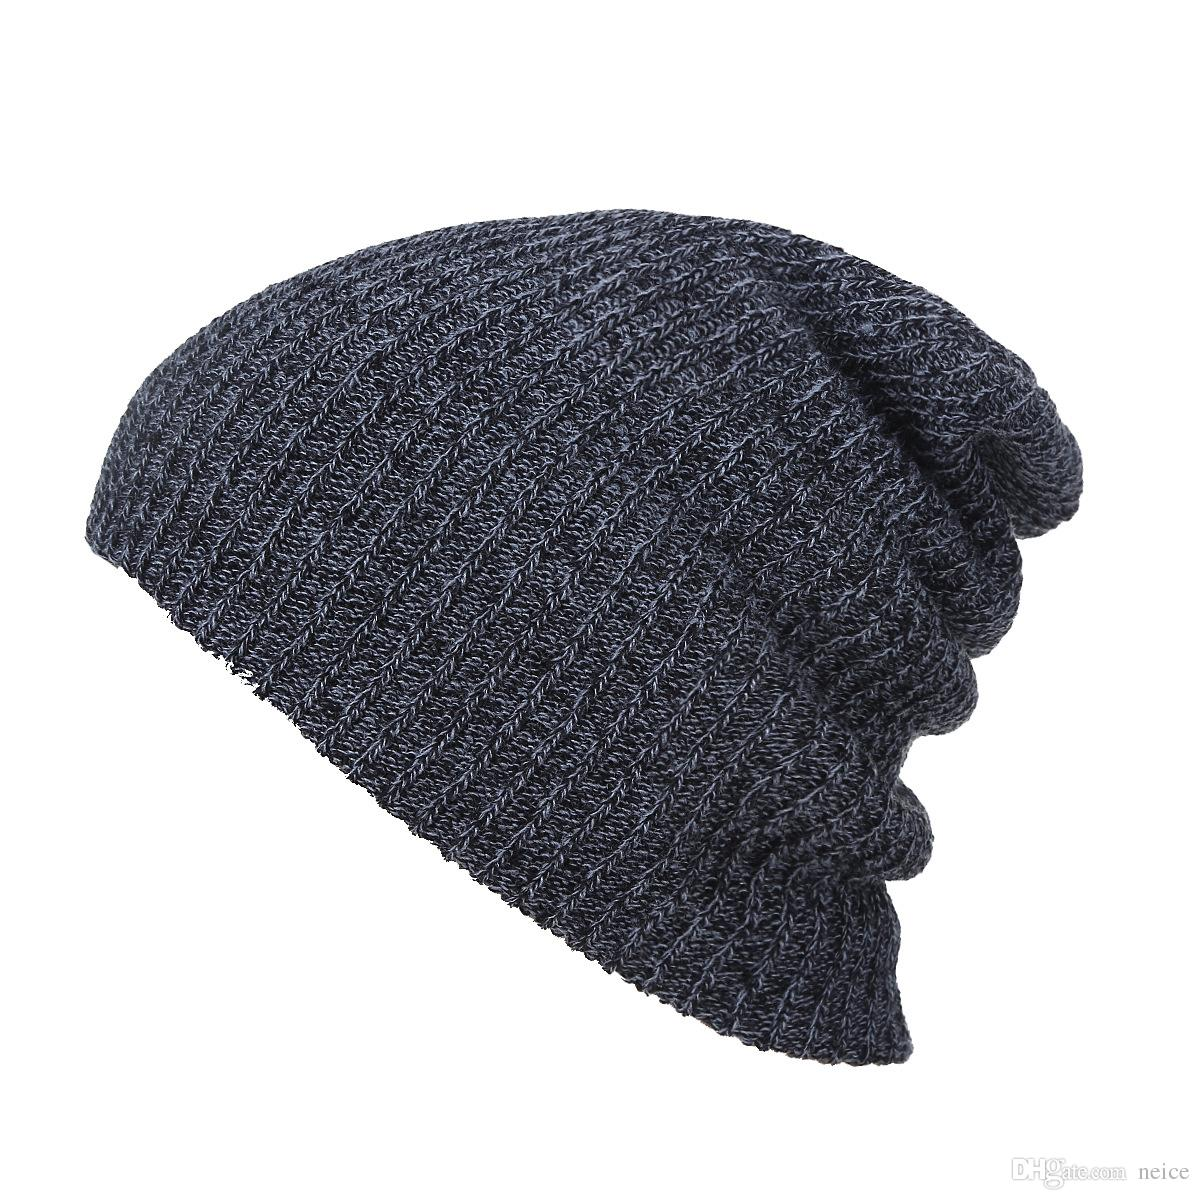 4b0b85d7aeb Knit Men s Women s Baggy Beanie Oversize Winter Warm Hat Ski Slouchy Chic  Crochet Knitted Cap Skull Winter Hats for Women Casual Cap Online with ...